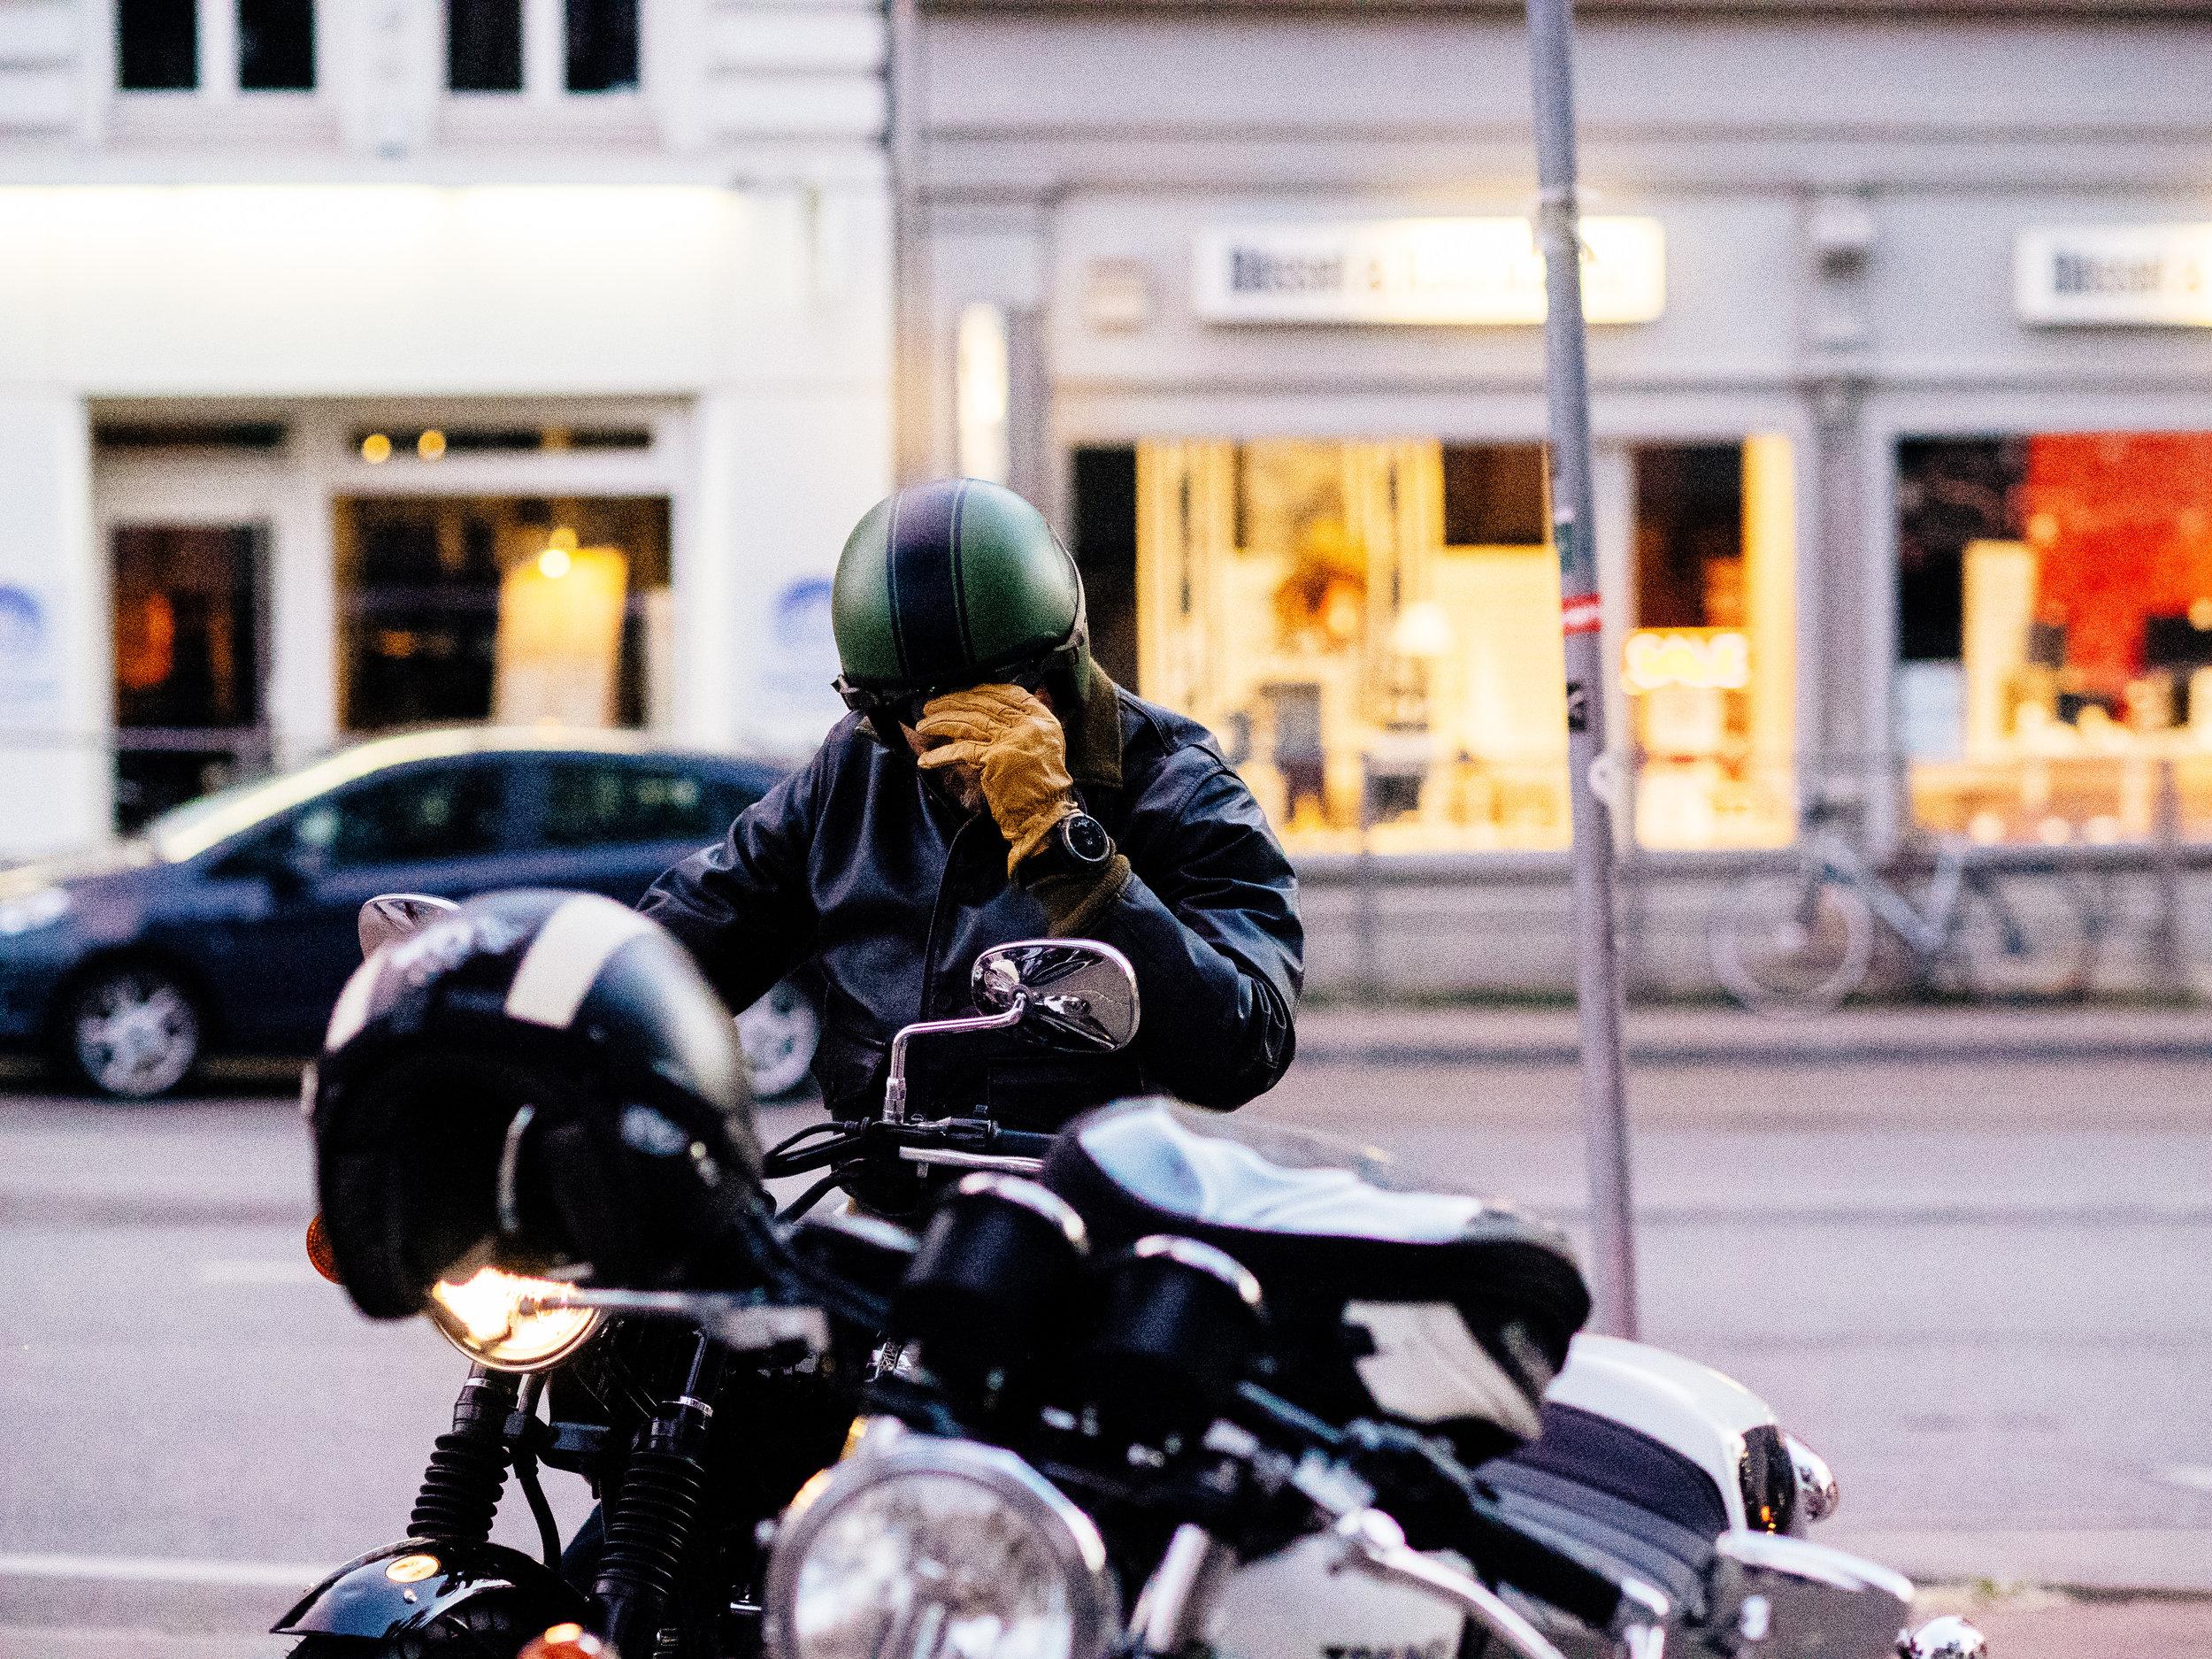 180524_themotosocial_Hamburg-159.jpg